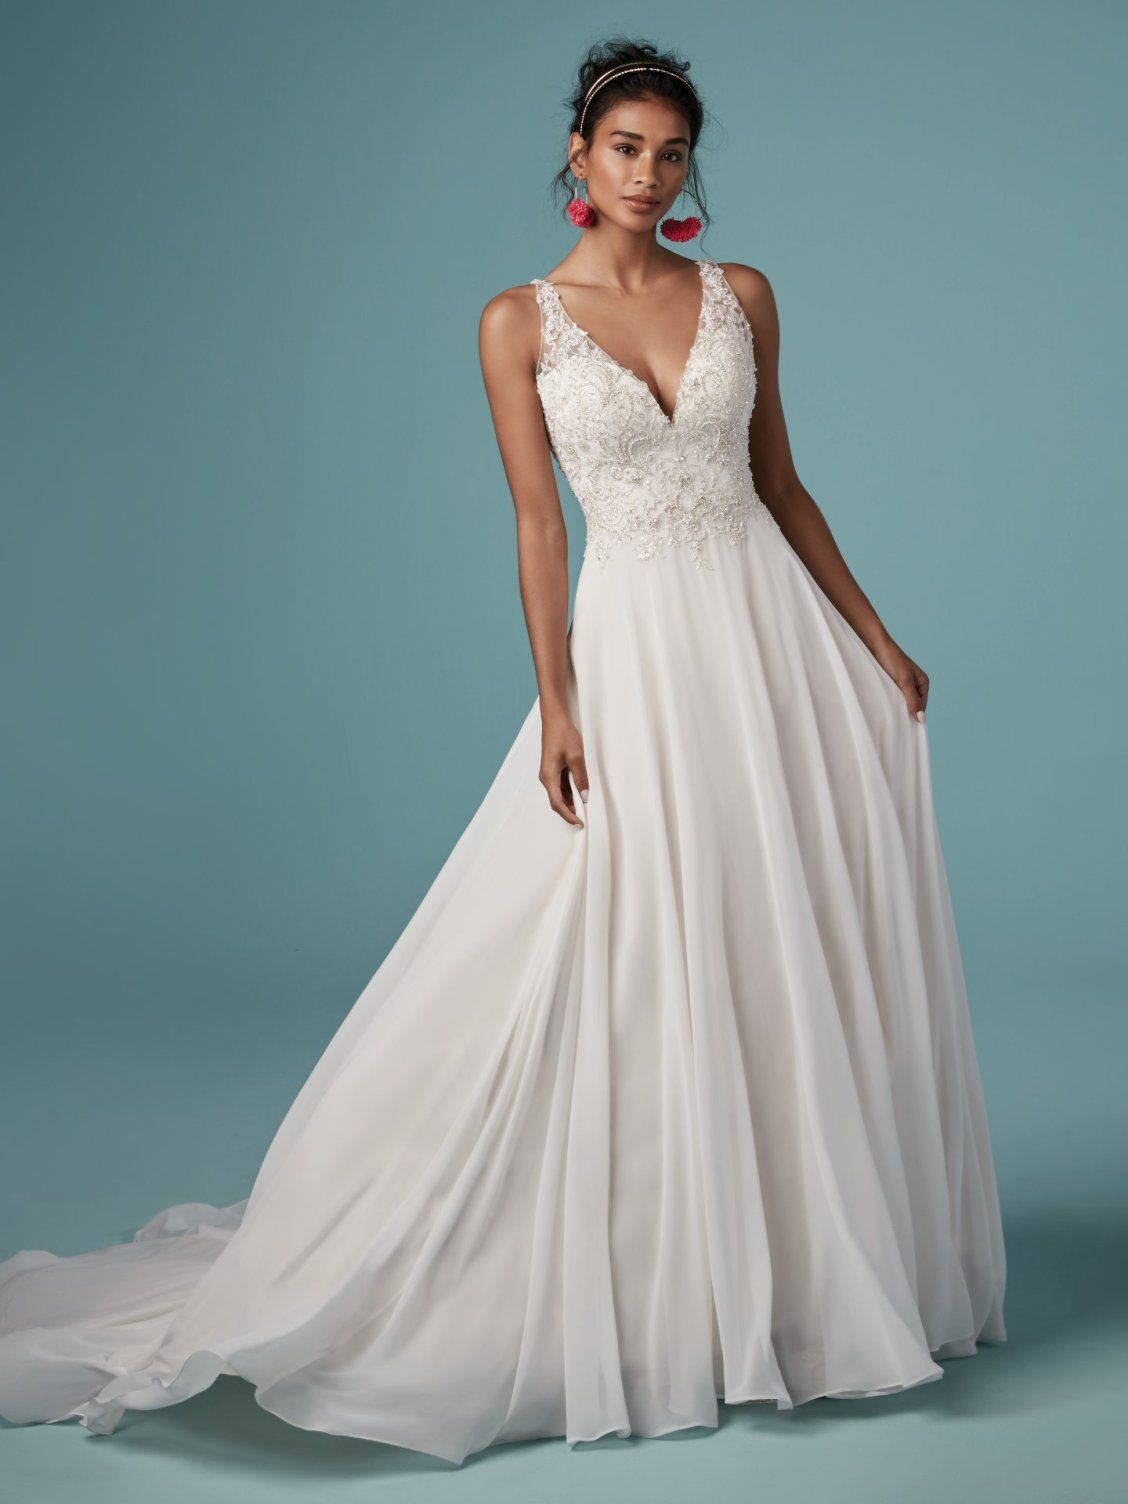 Kiera By Maggie Sottero Wedding Dresses In 2020 Maggie Sottero